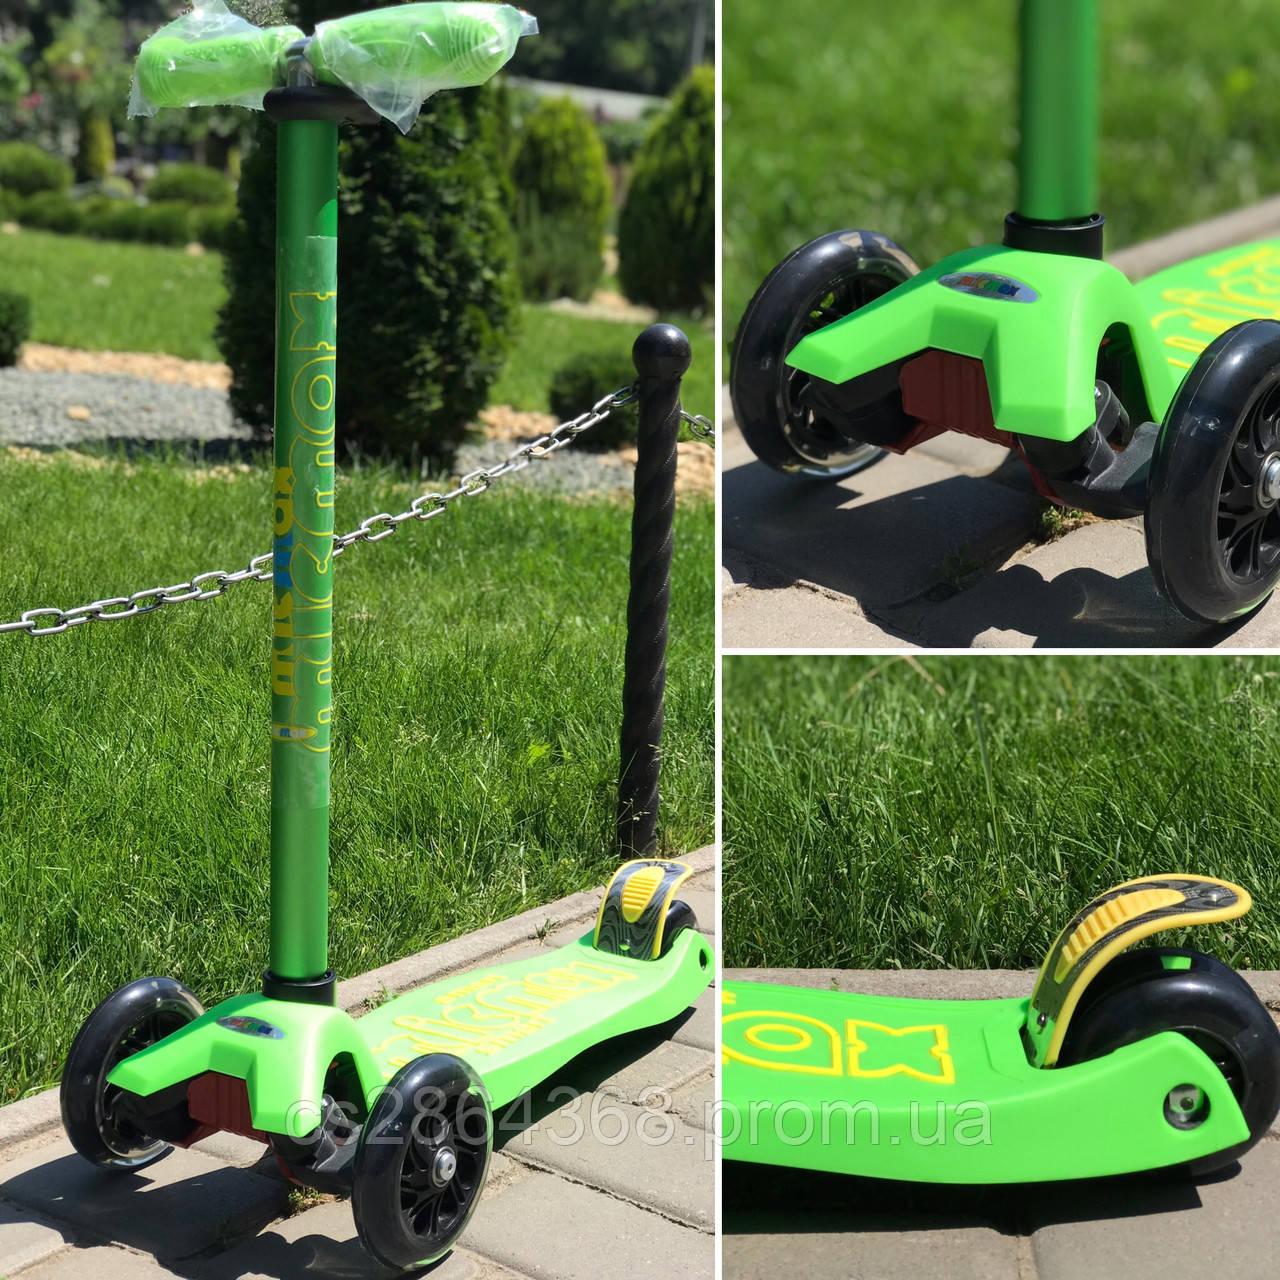 Детский самокат MicMax Smart Green со светящимися колесами: ABEC-7, возраст 3+